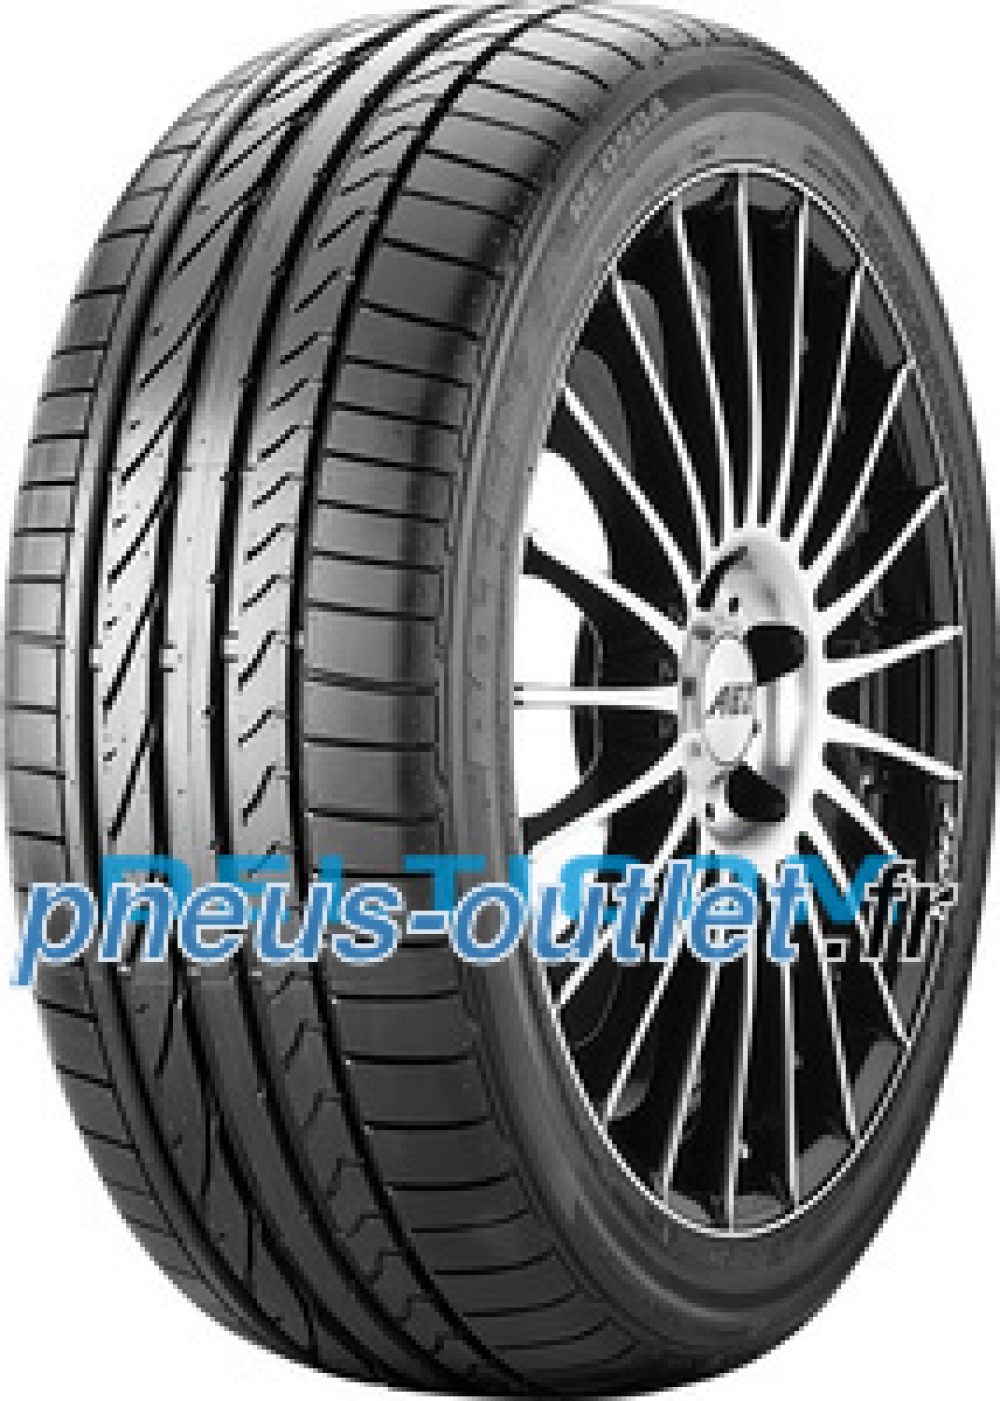 Bridgestone Potenza RE 050 A EXT ( 255/40 R17 94W MOE, avec protège-jante (MFS), runflat )